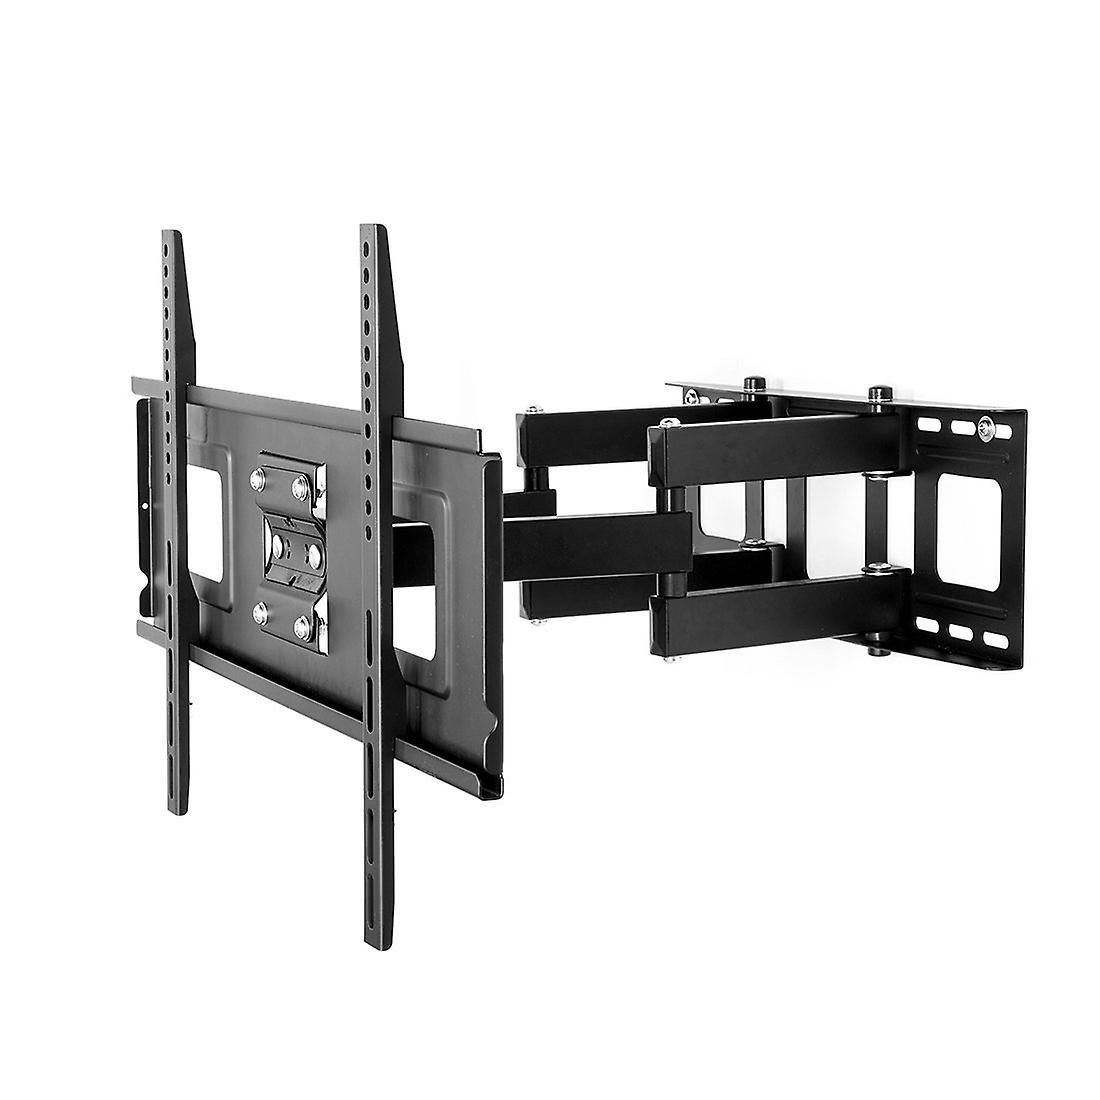 Fleximtellingen A04 Full Motion articulating TV muurbeugel voor 32-65 inch LED LCD HD 4K plasma